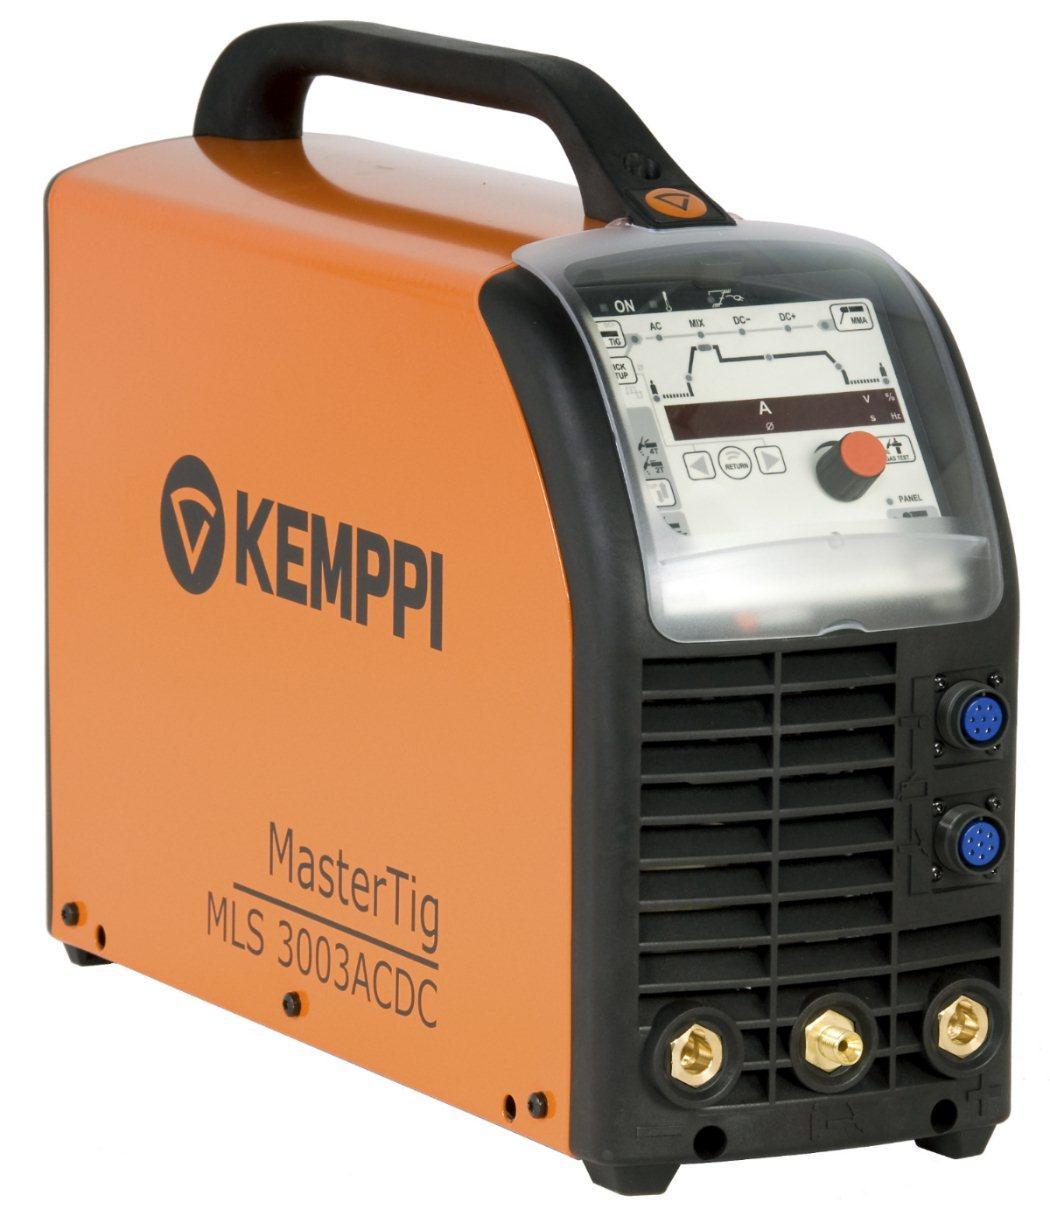 P0968 Kemppi Mastertig 3003 MLS AC/DC Tig Welder With ACX Panel Option. 415V